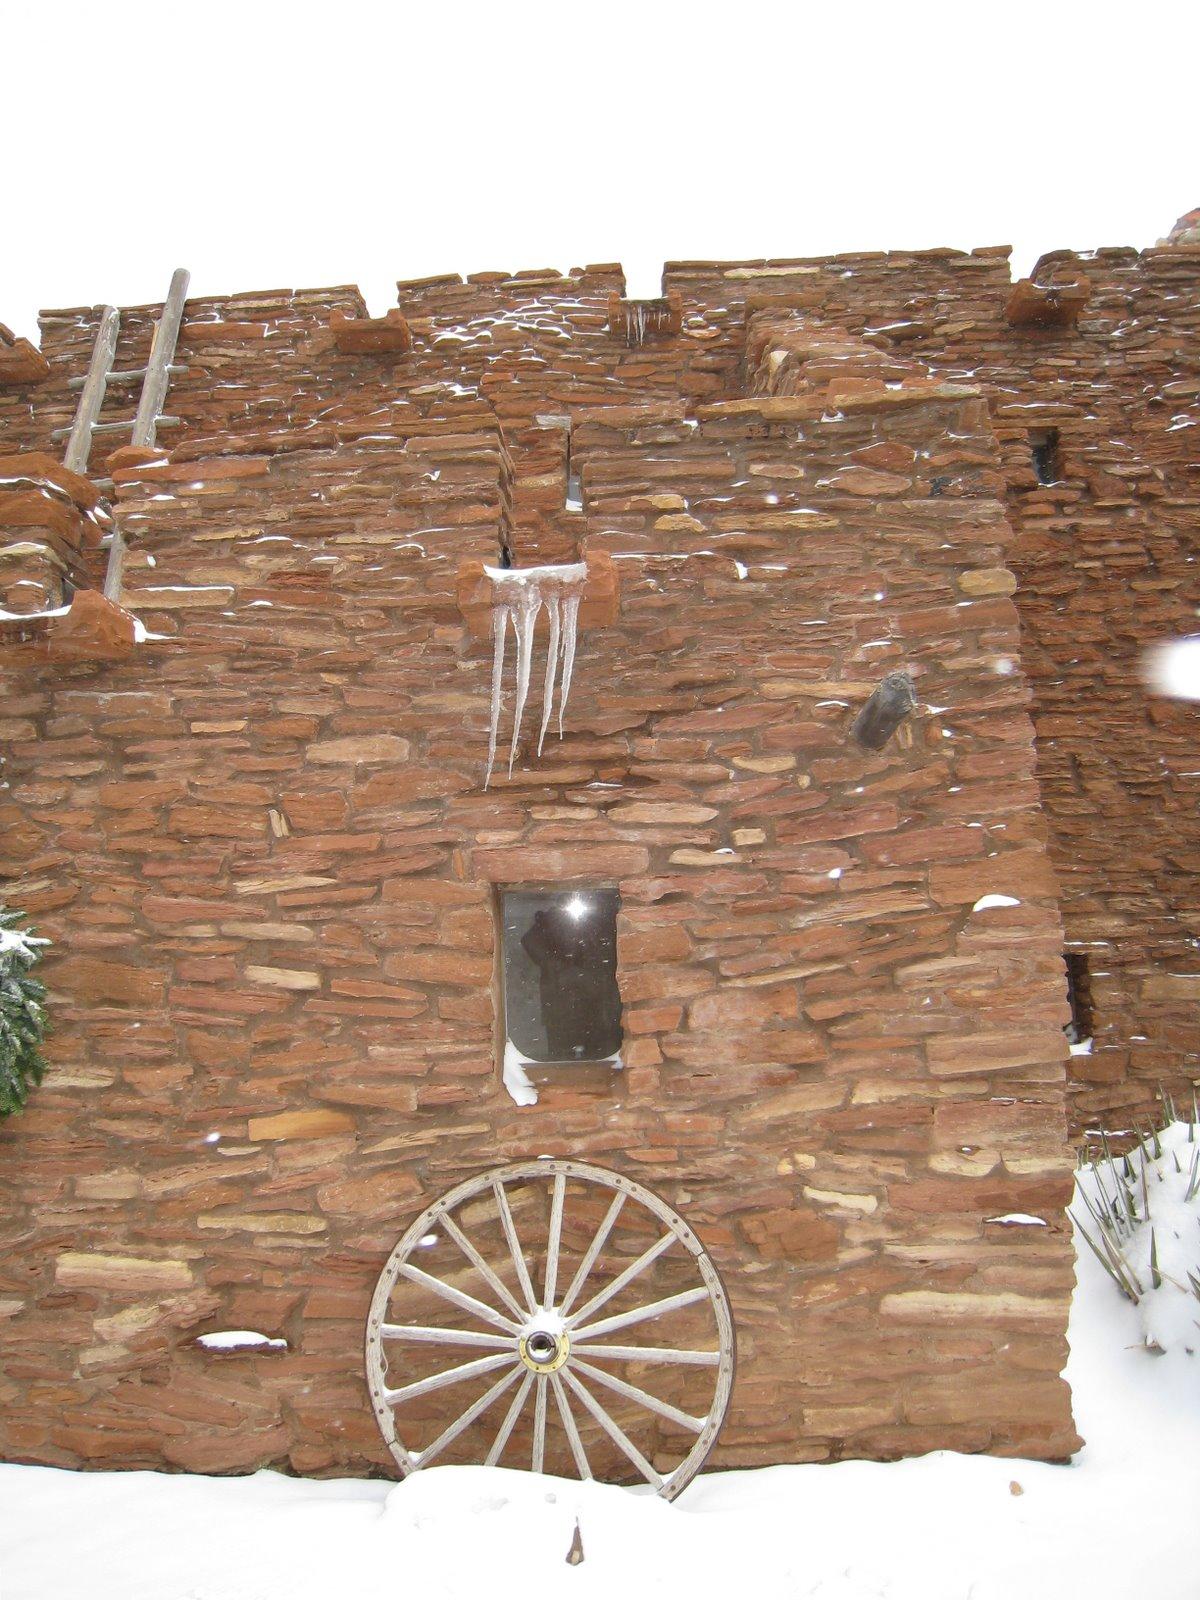 Hopi House